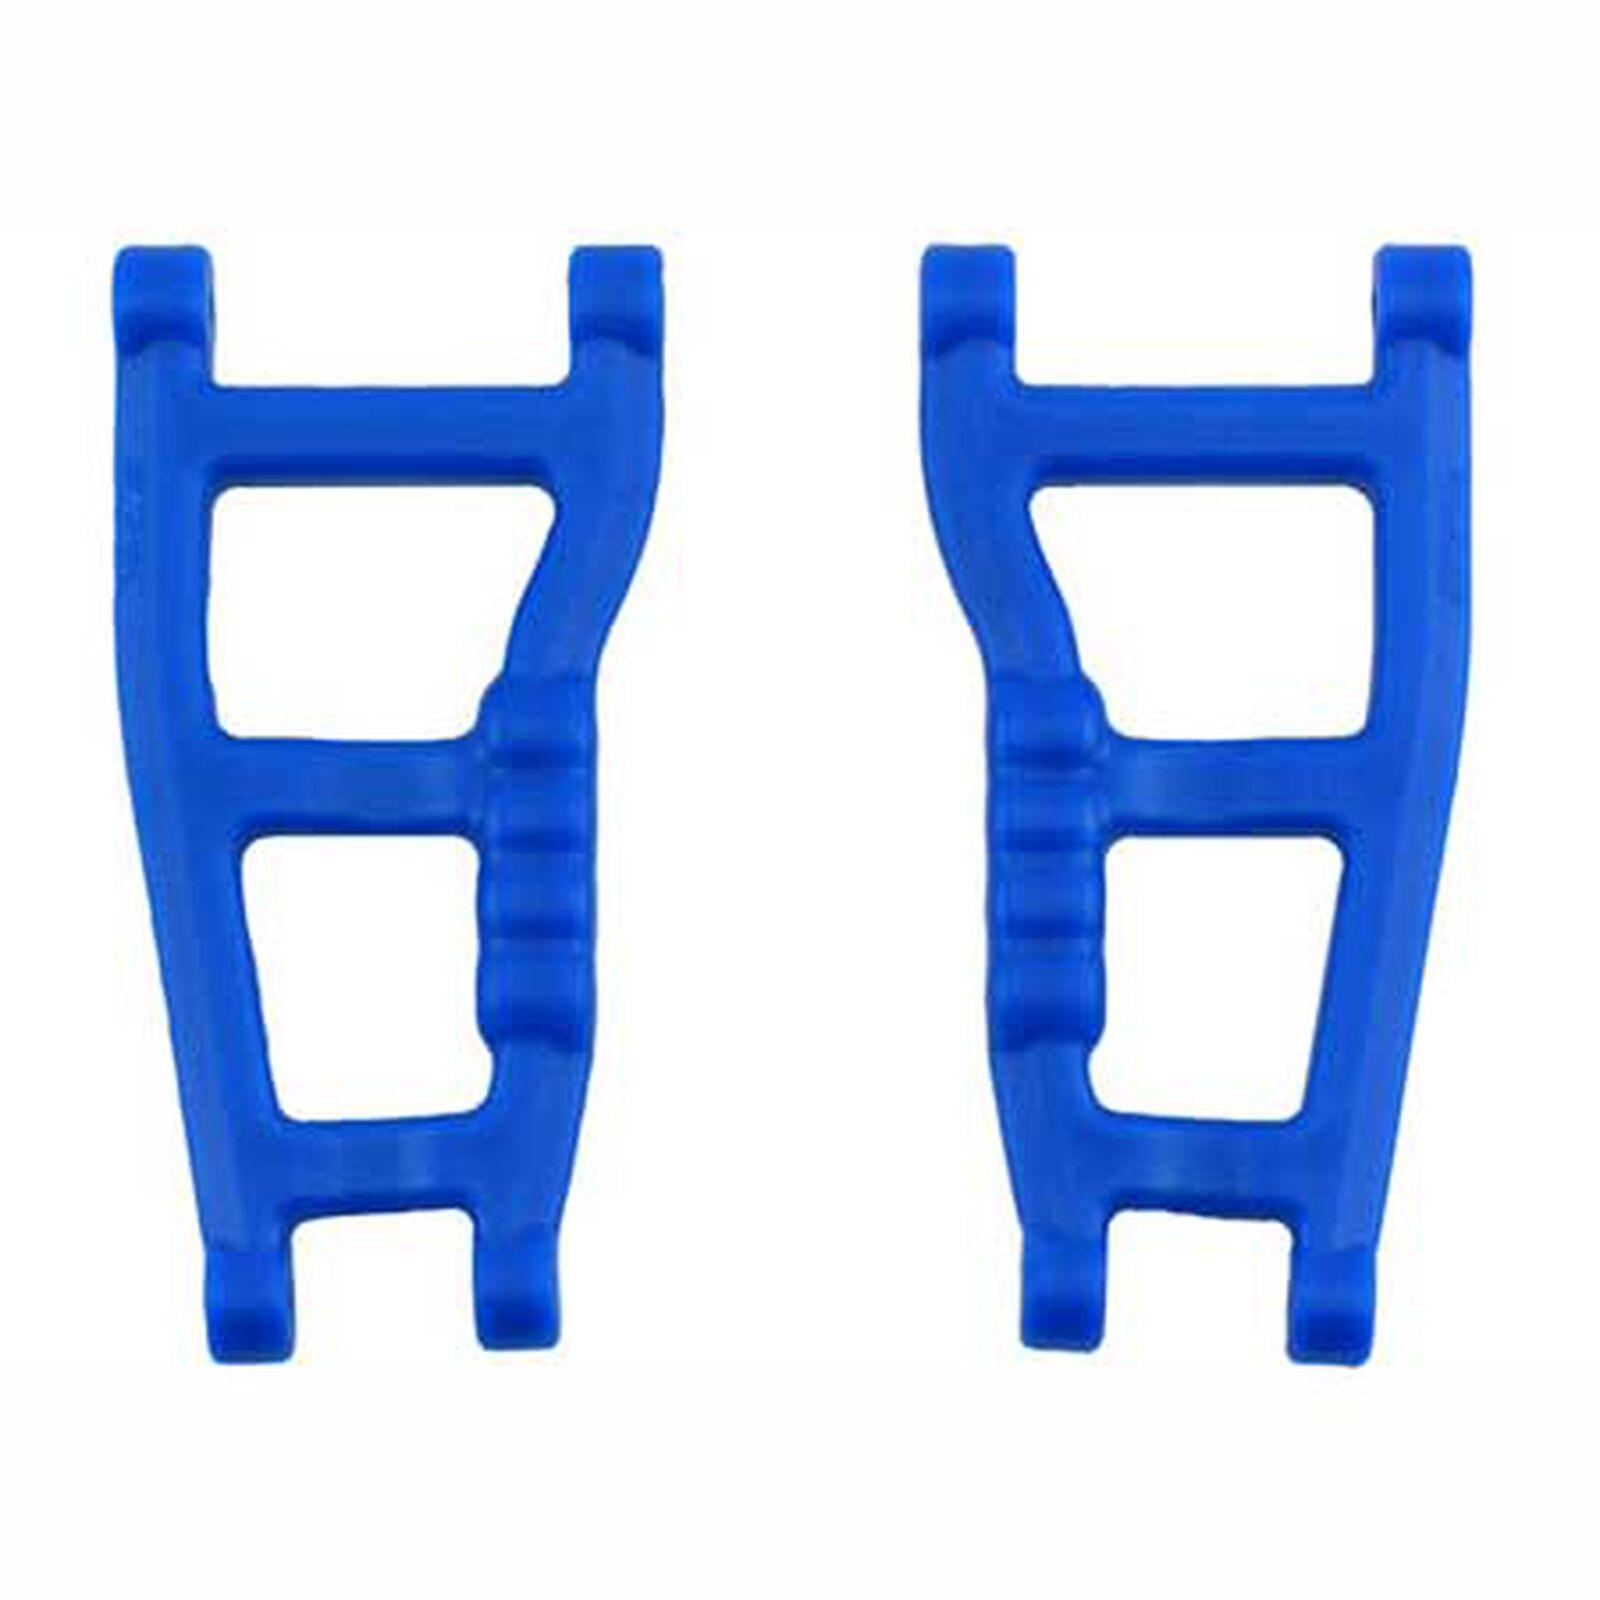 Rear A-Arms (2), Blue: RU, ST